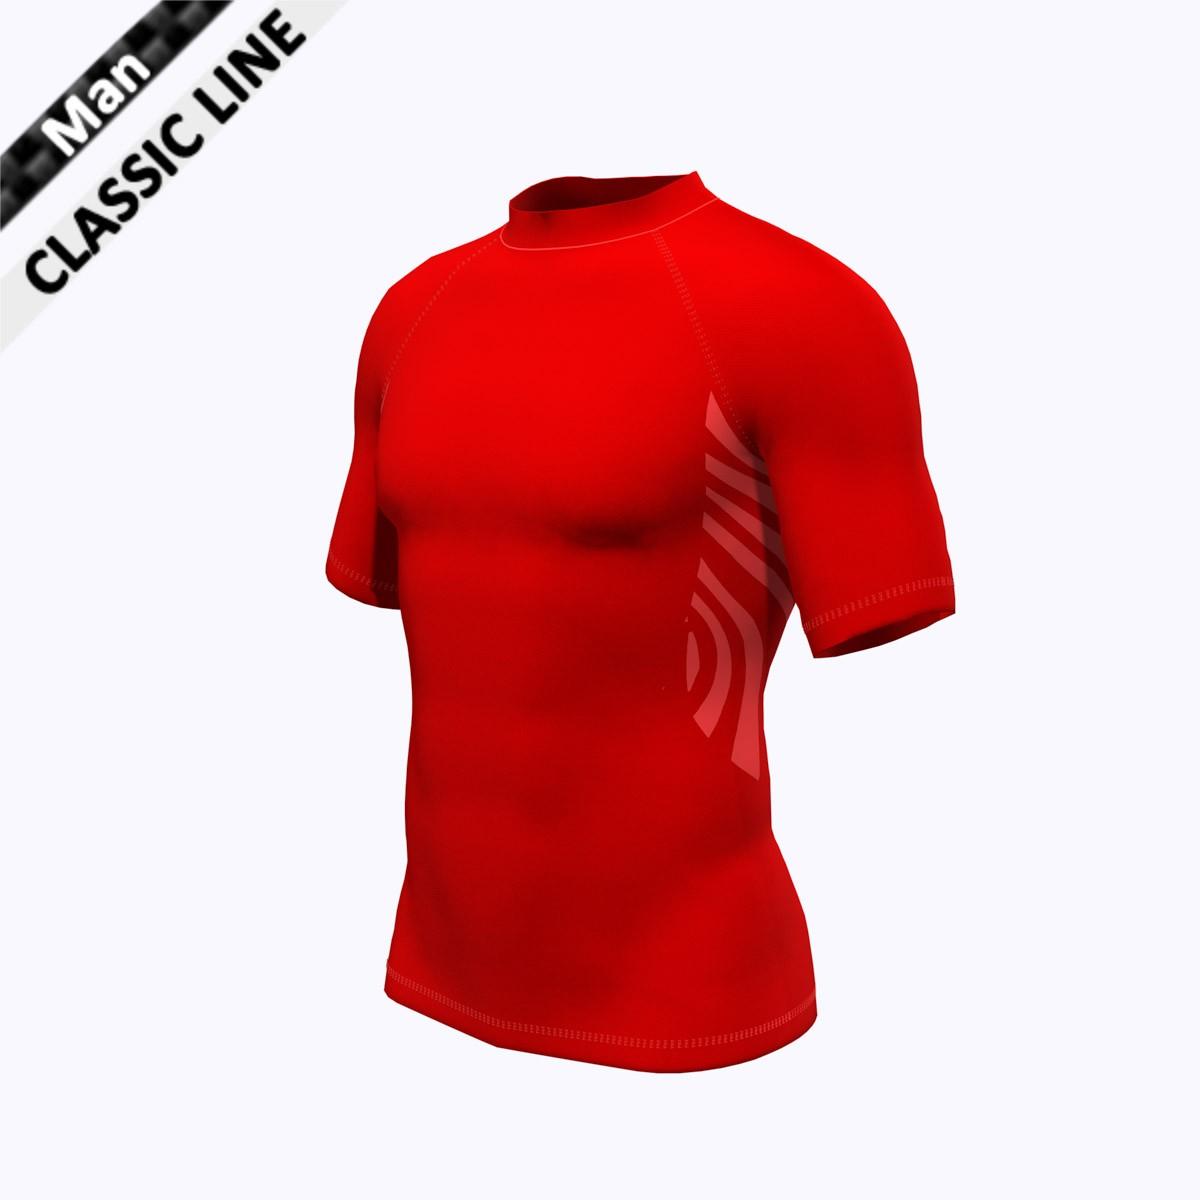 2skin - Shirt rot